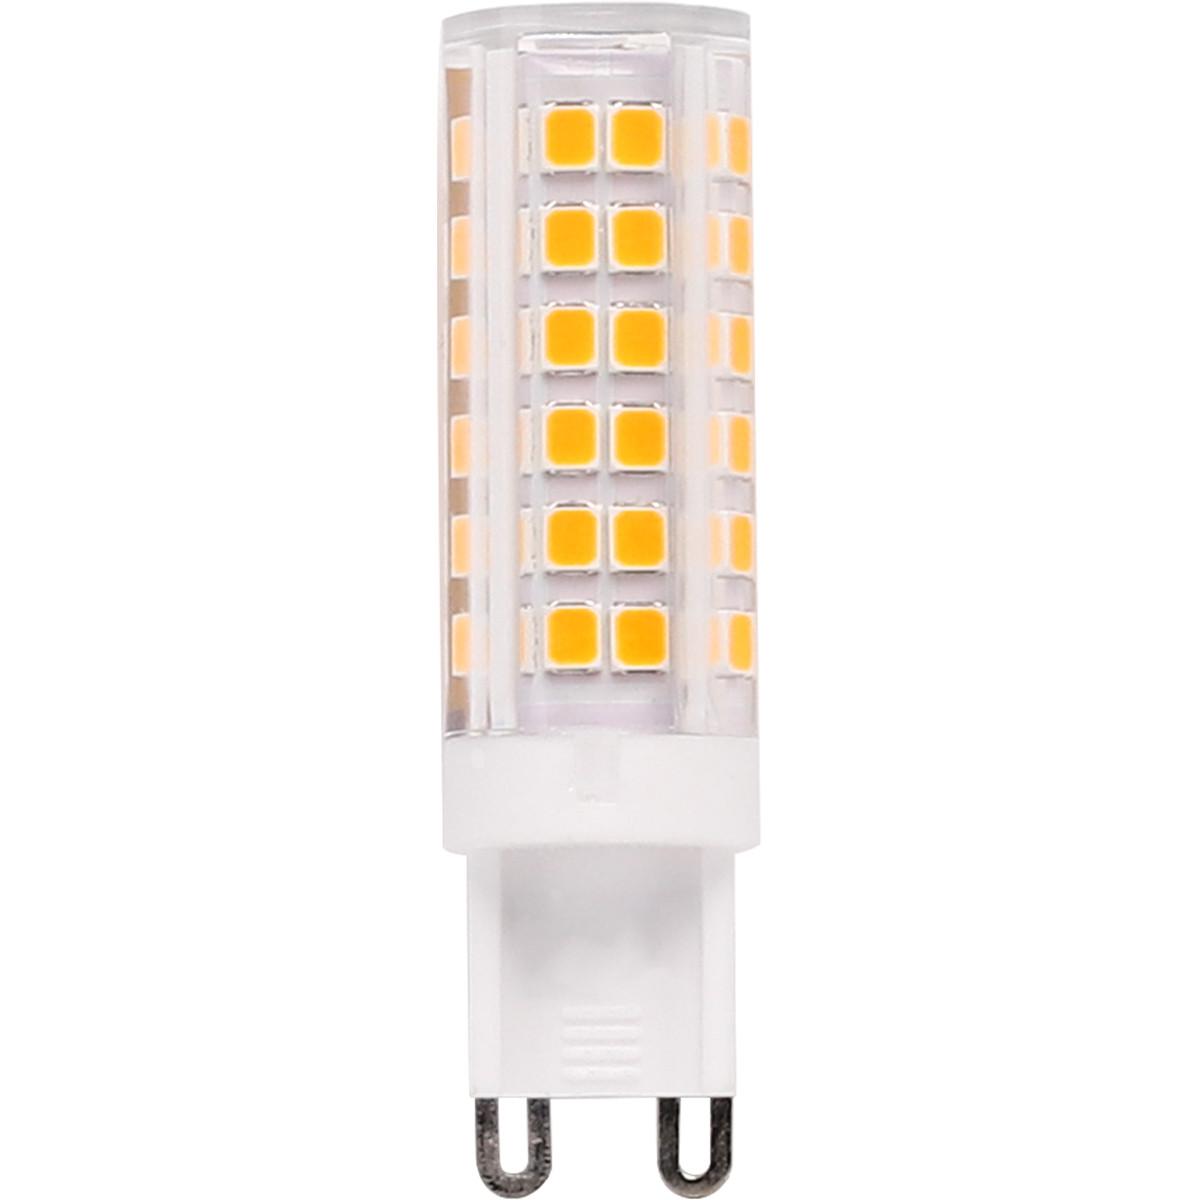 LED Lamp - Aigi - G9 Fitting - 5W - Helder/Koud Wit 6500K | Vervangt 45W